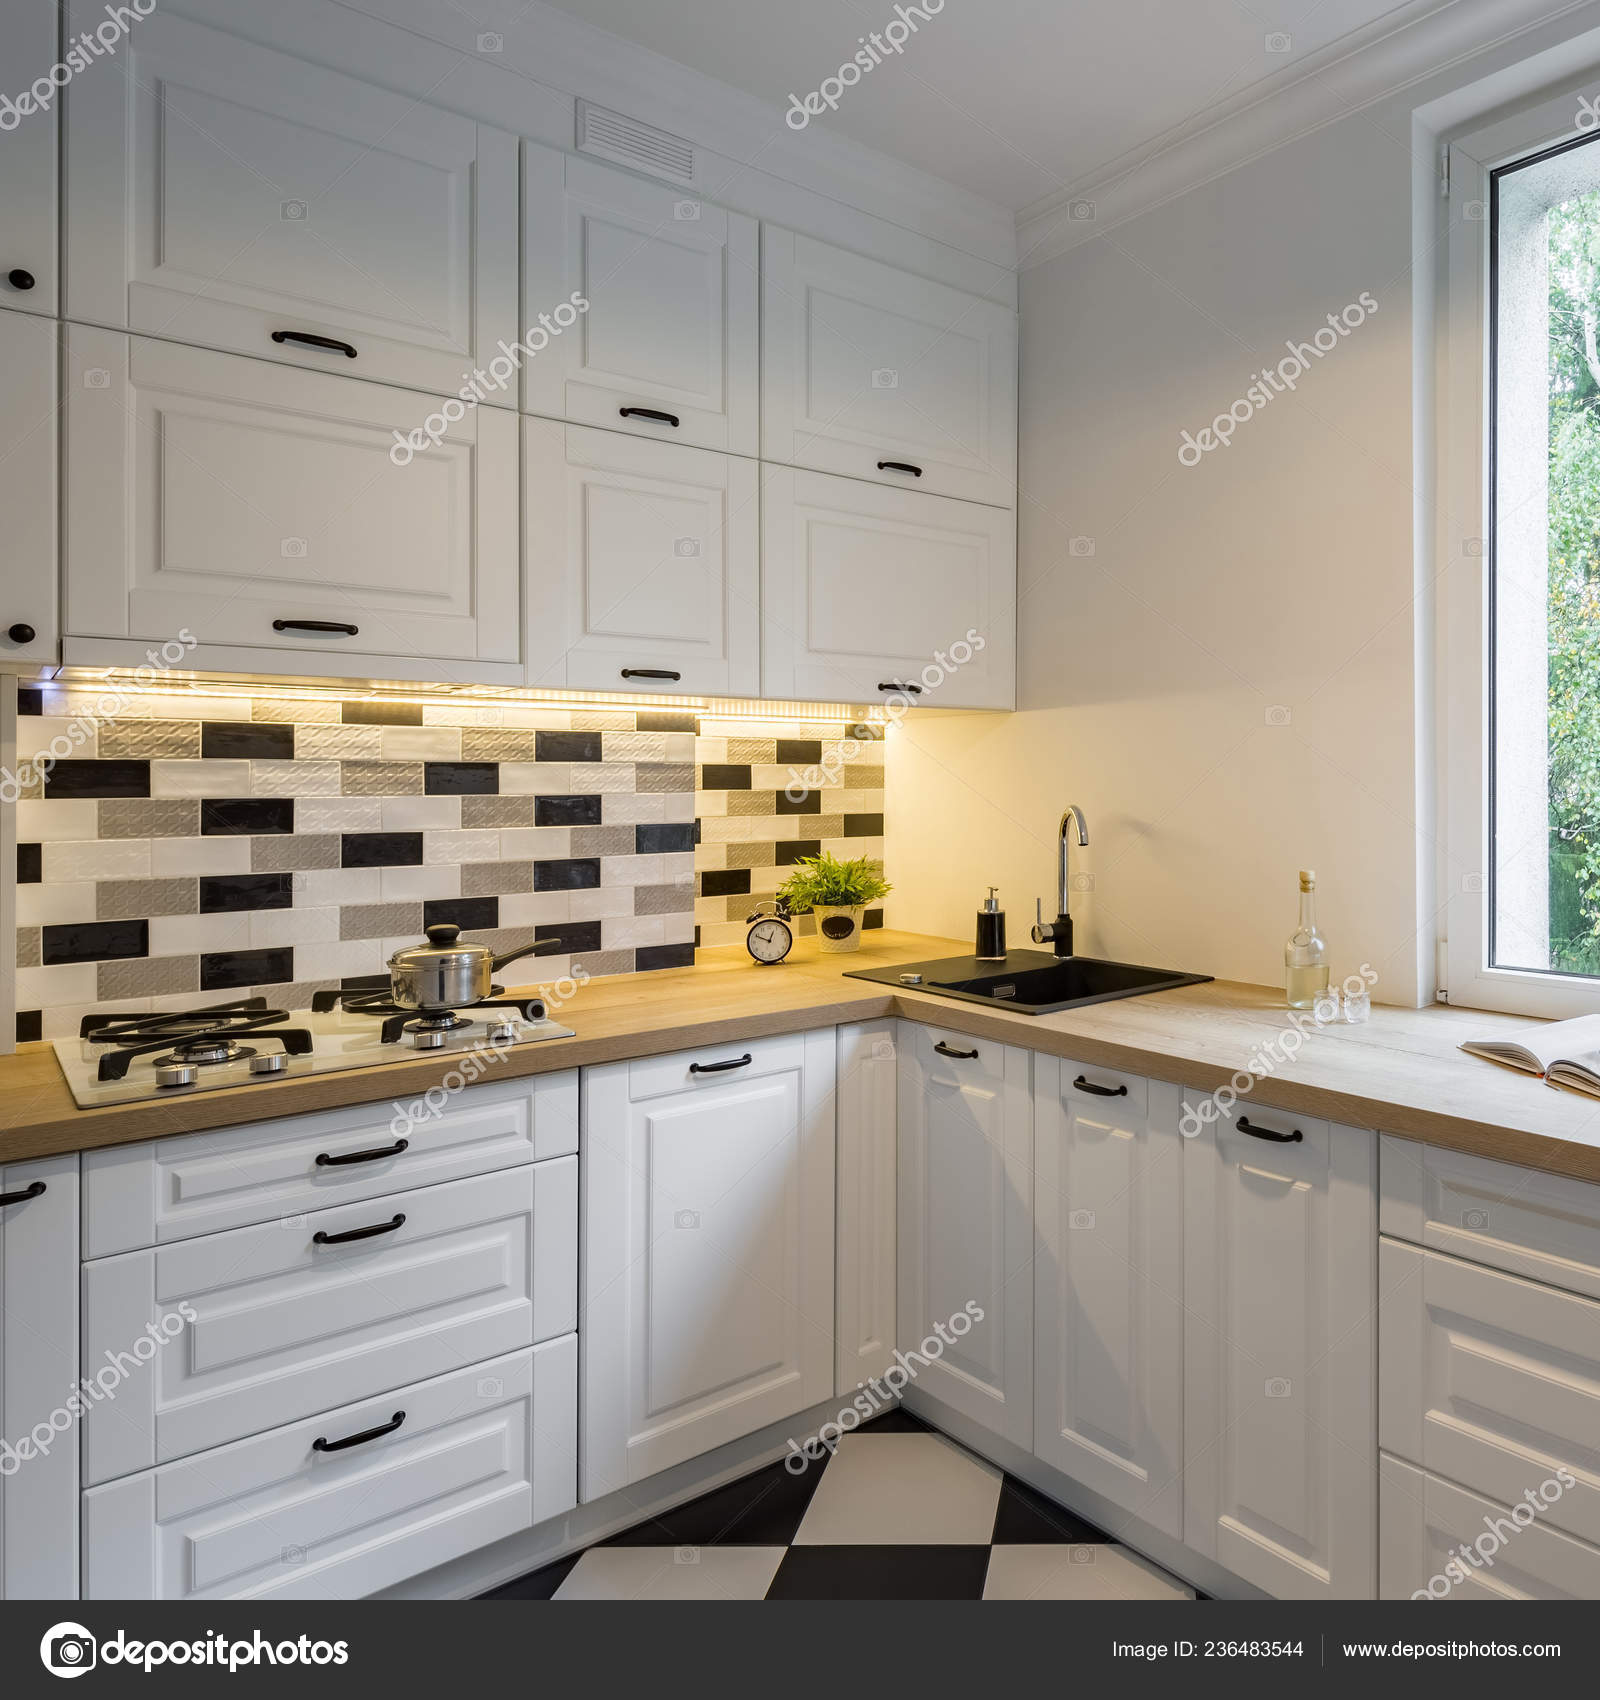 Cucina Funzionale Con Armadi Bianchi Classici Illuminazione ...